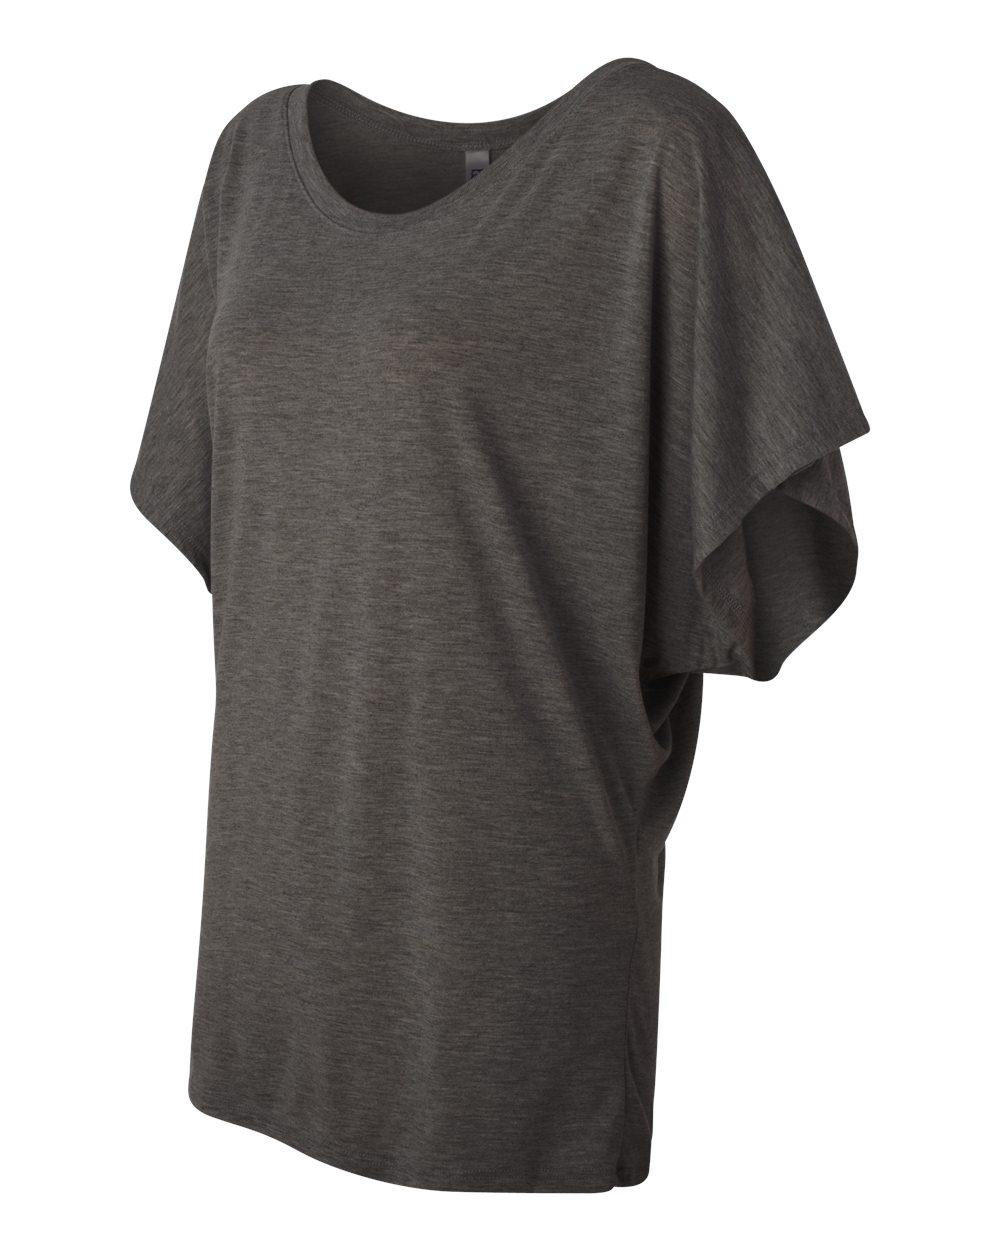 Bella-Canvas-Women-039-s-Flowy-Draped-Sleeve-Dolman-T-Shirt-8821-S-2XL thumbnail 21